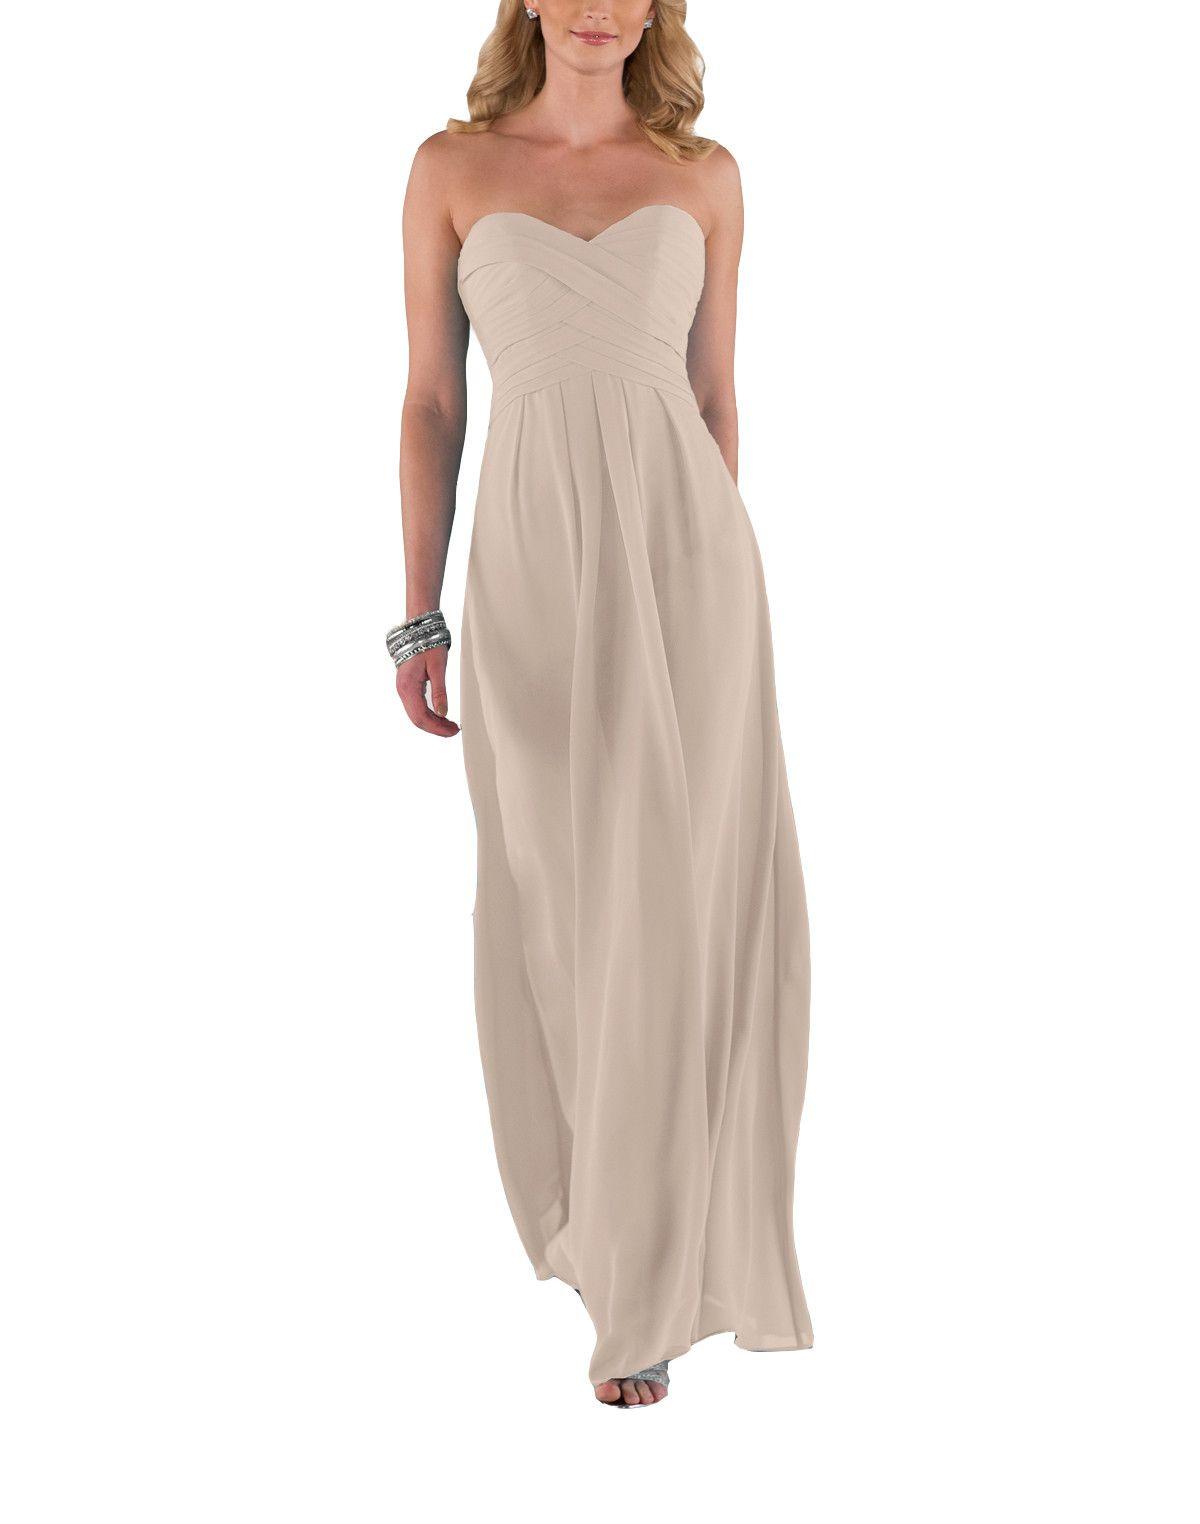 DescriptionSorella Vita Style 8405Fulllength bridesmaid dressSweetheart necklineRuched bodiceChiffon